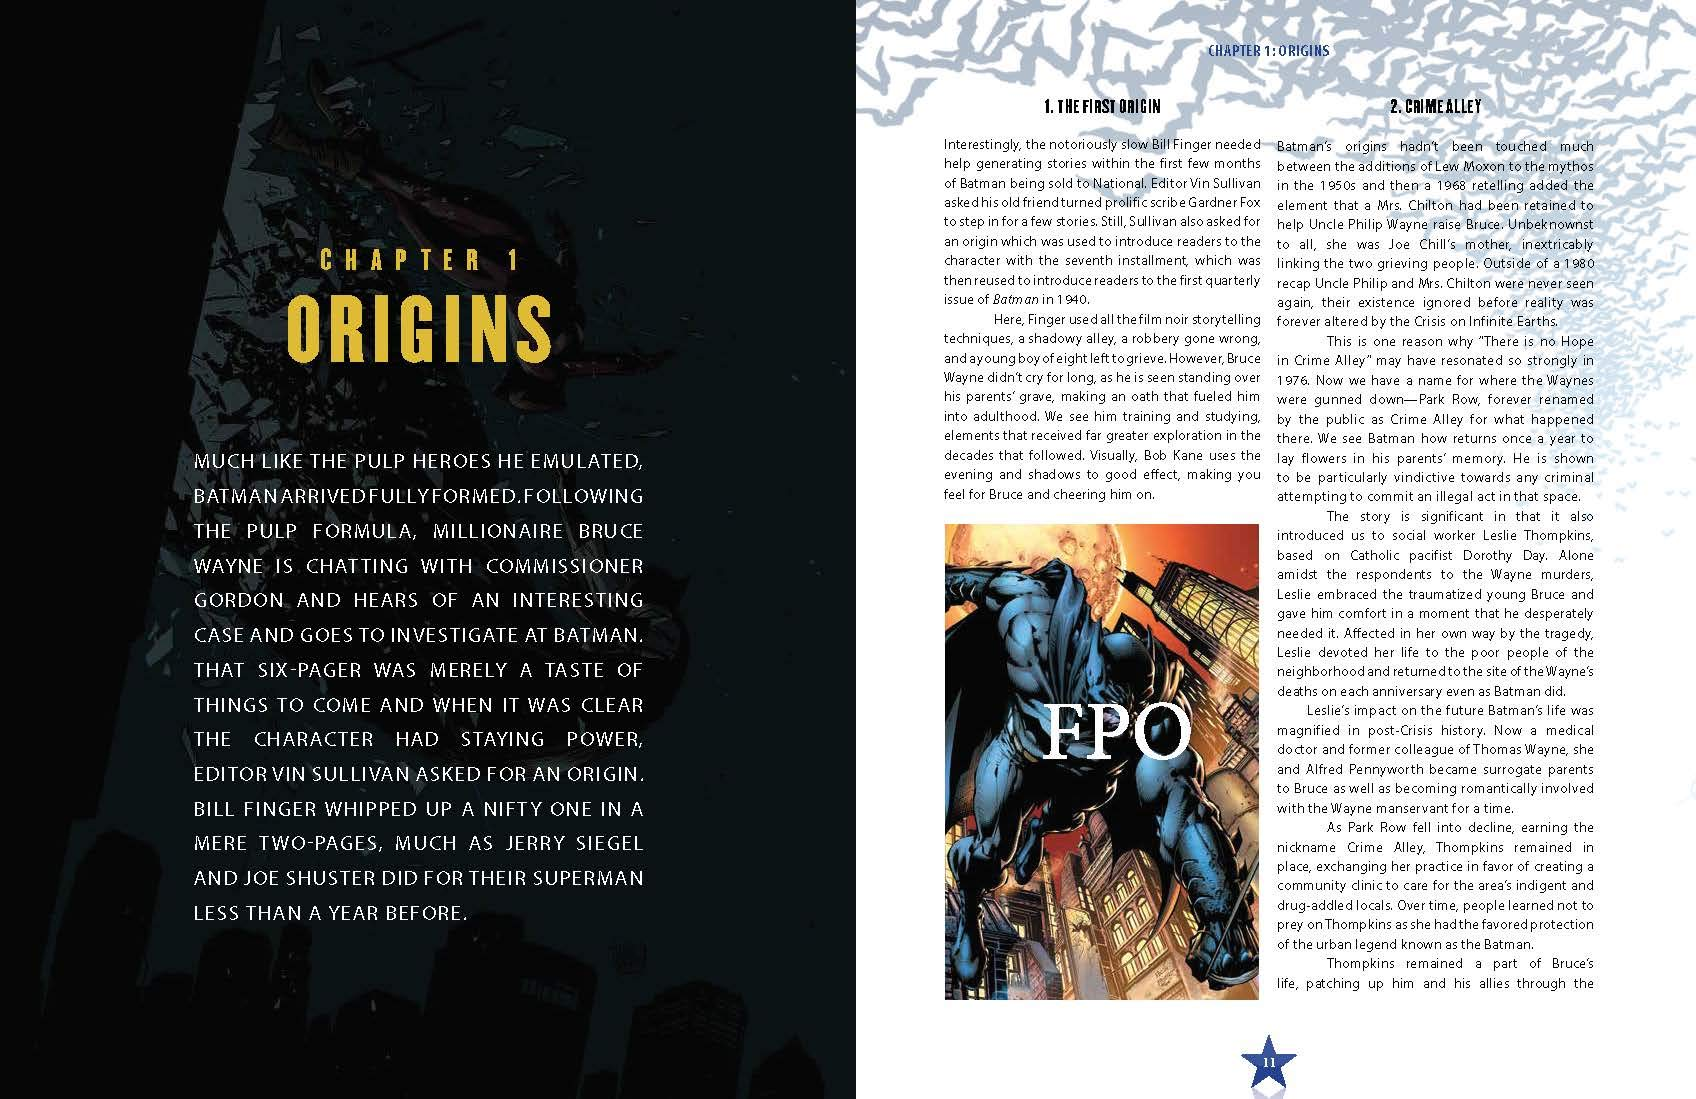 Batman: 100 Greatest Moments, by Robert Greenberger